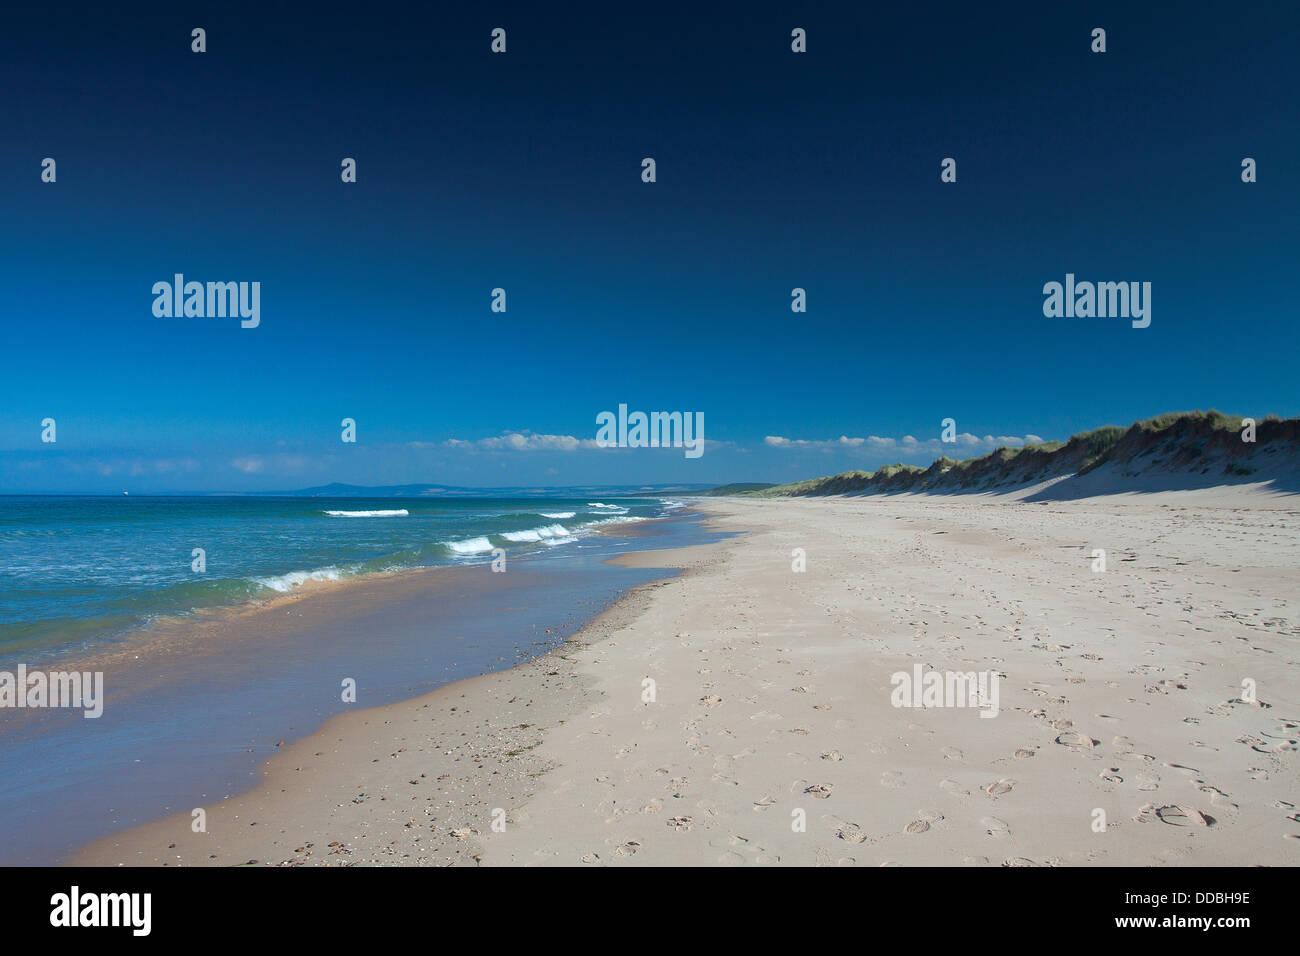 Lossiemouth Beach, Lossiemouth, Moray - Stock Image